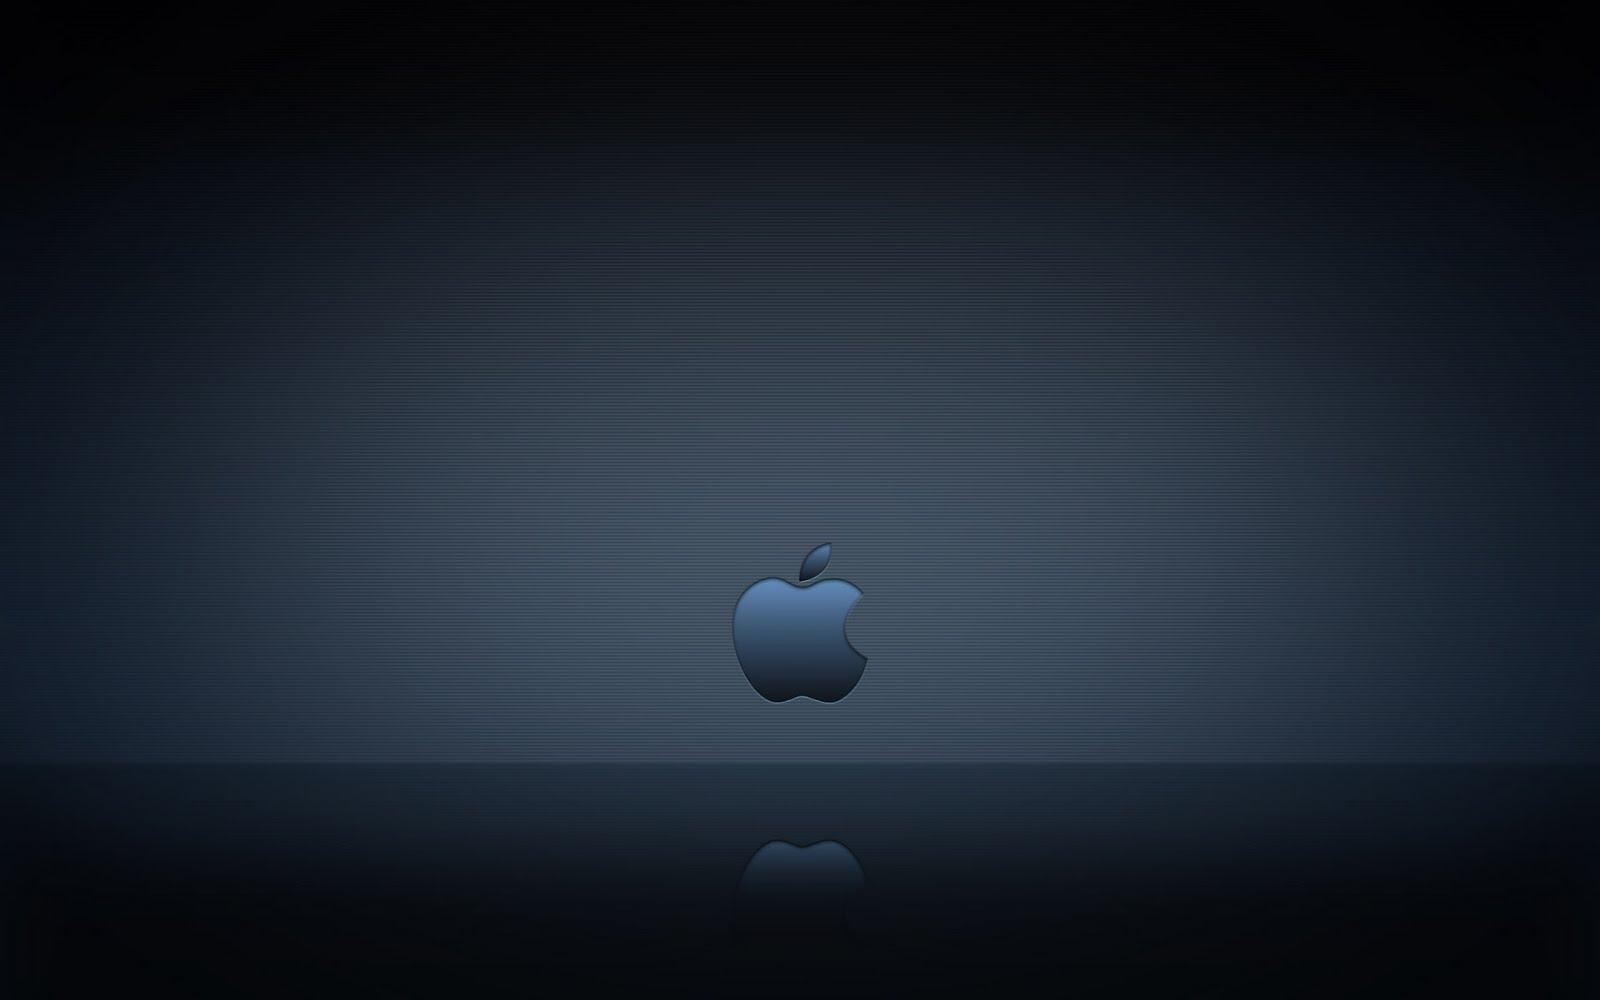 Apple iPhone  Desktop Backgrounds Red2BBlack Apple sexy mac apple 1600x1000